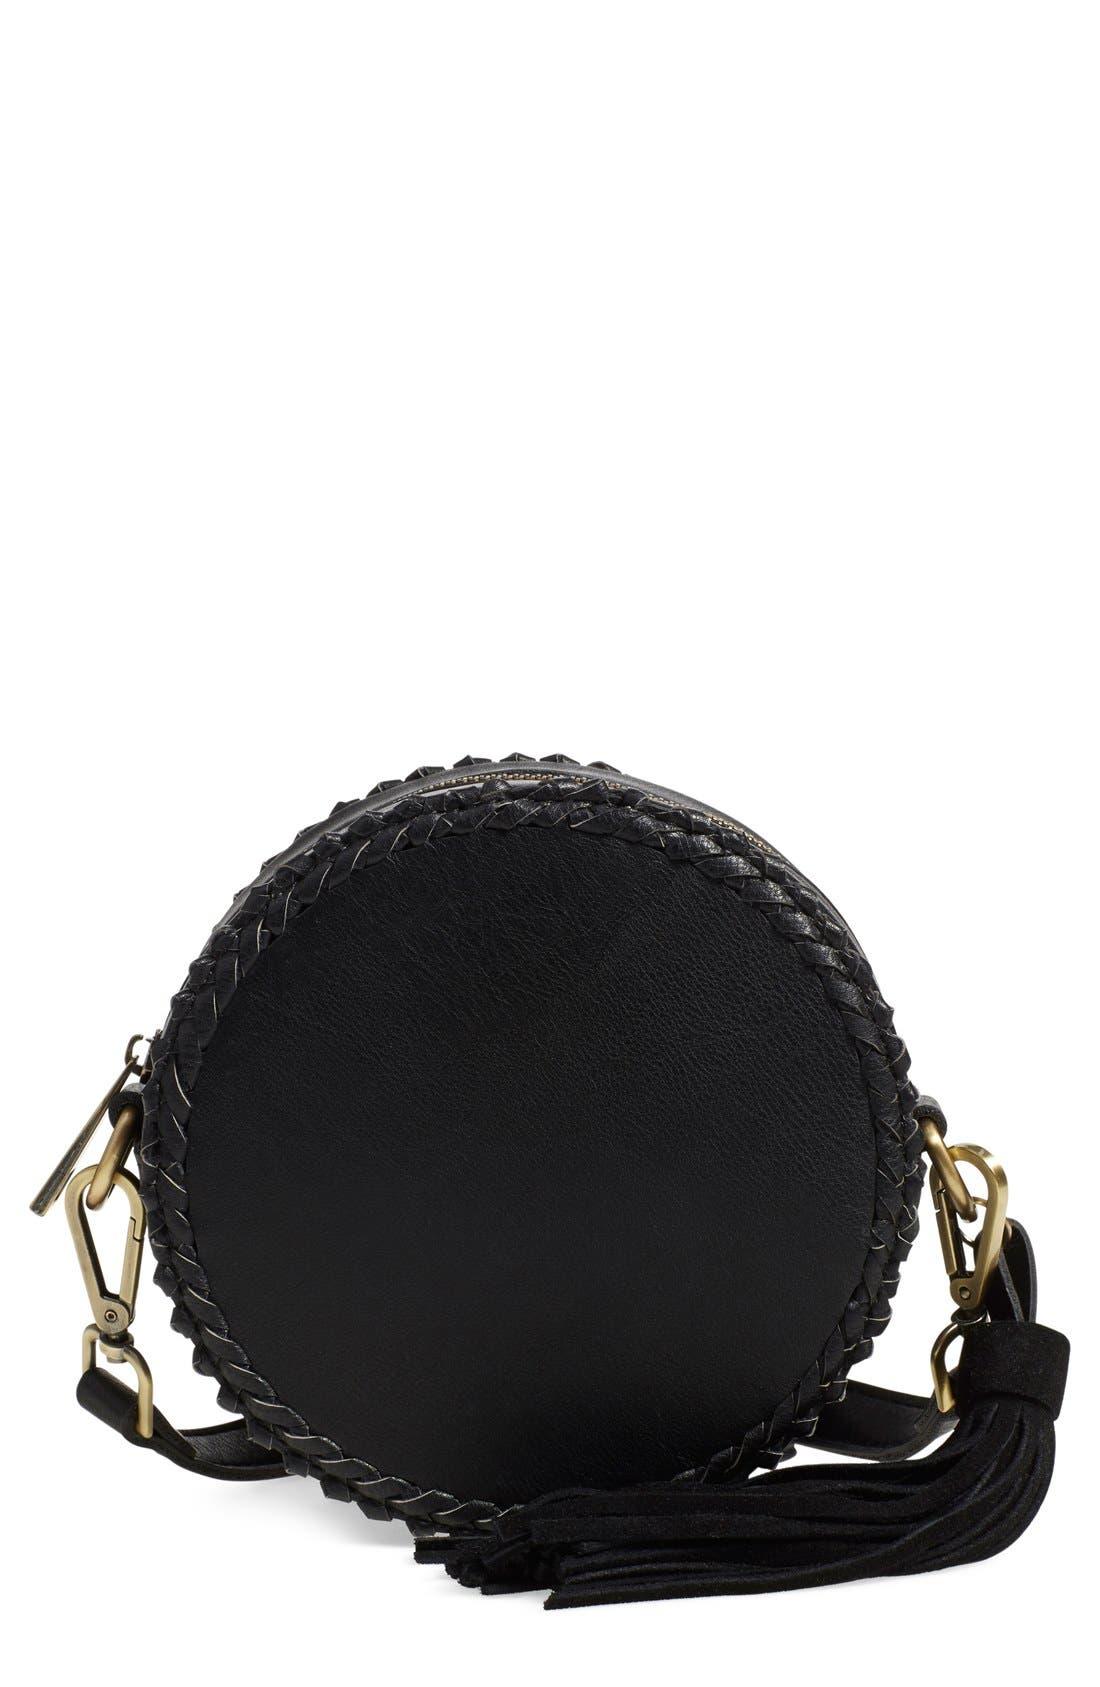 Alternate Image 1 Selected - Street Level Round Crossbody Bag